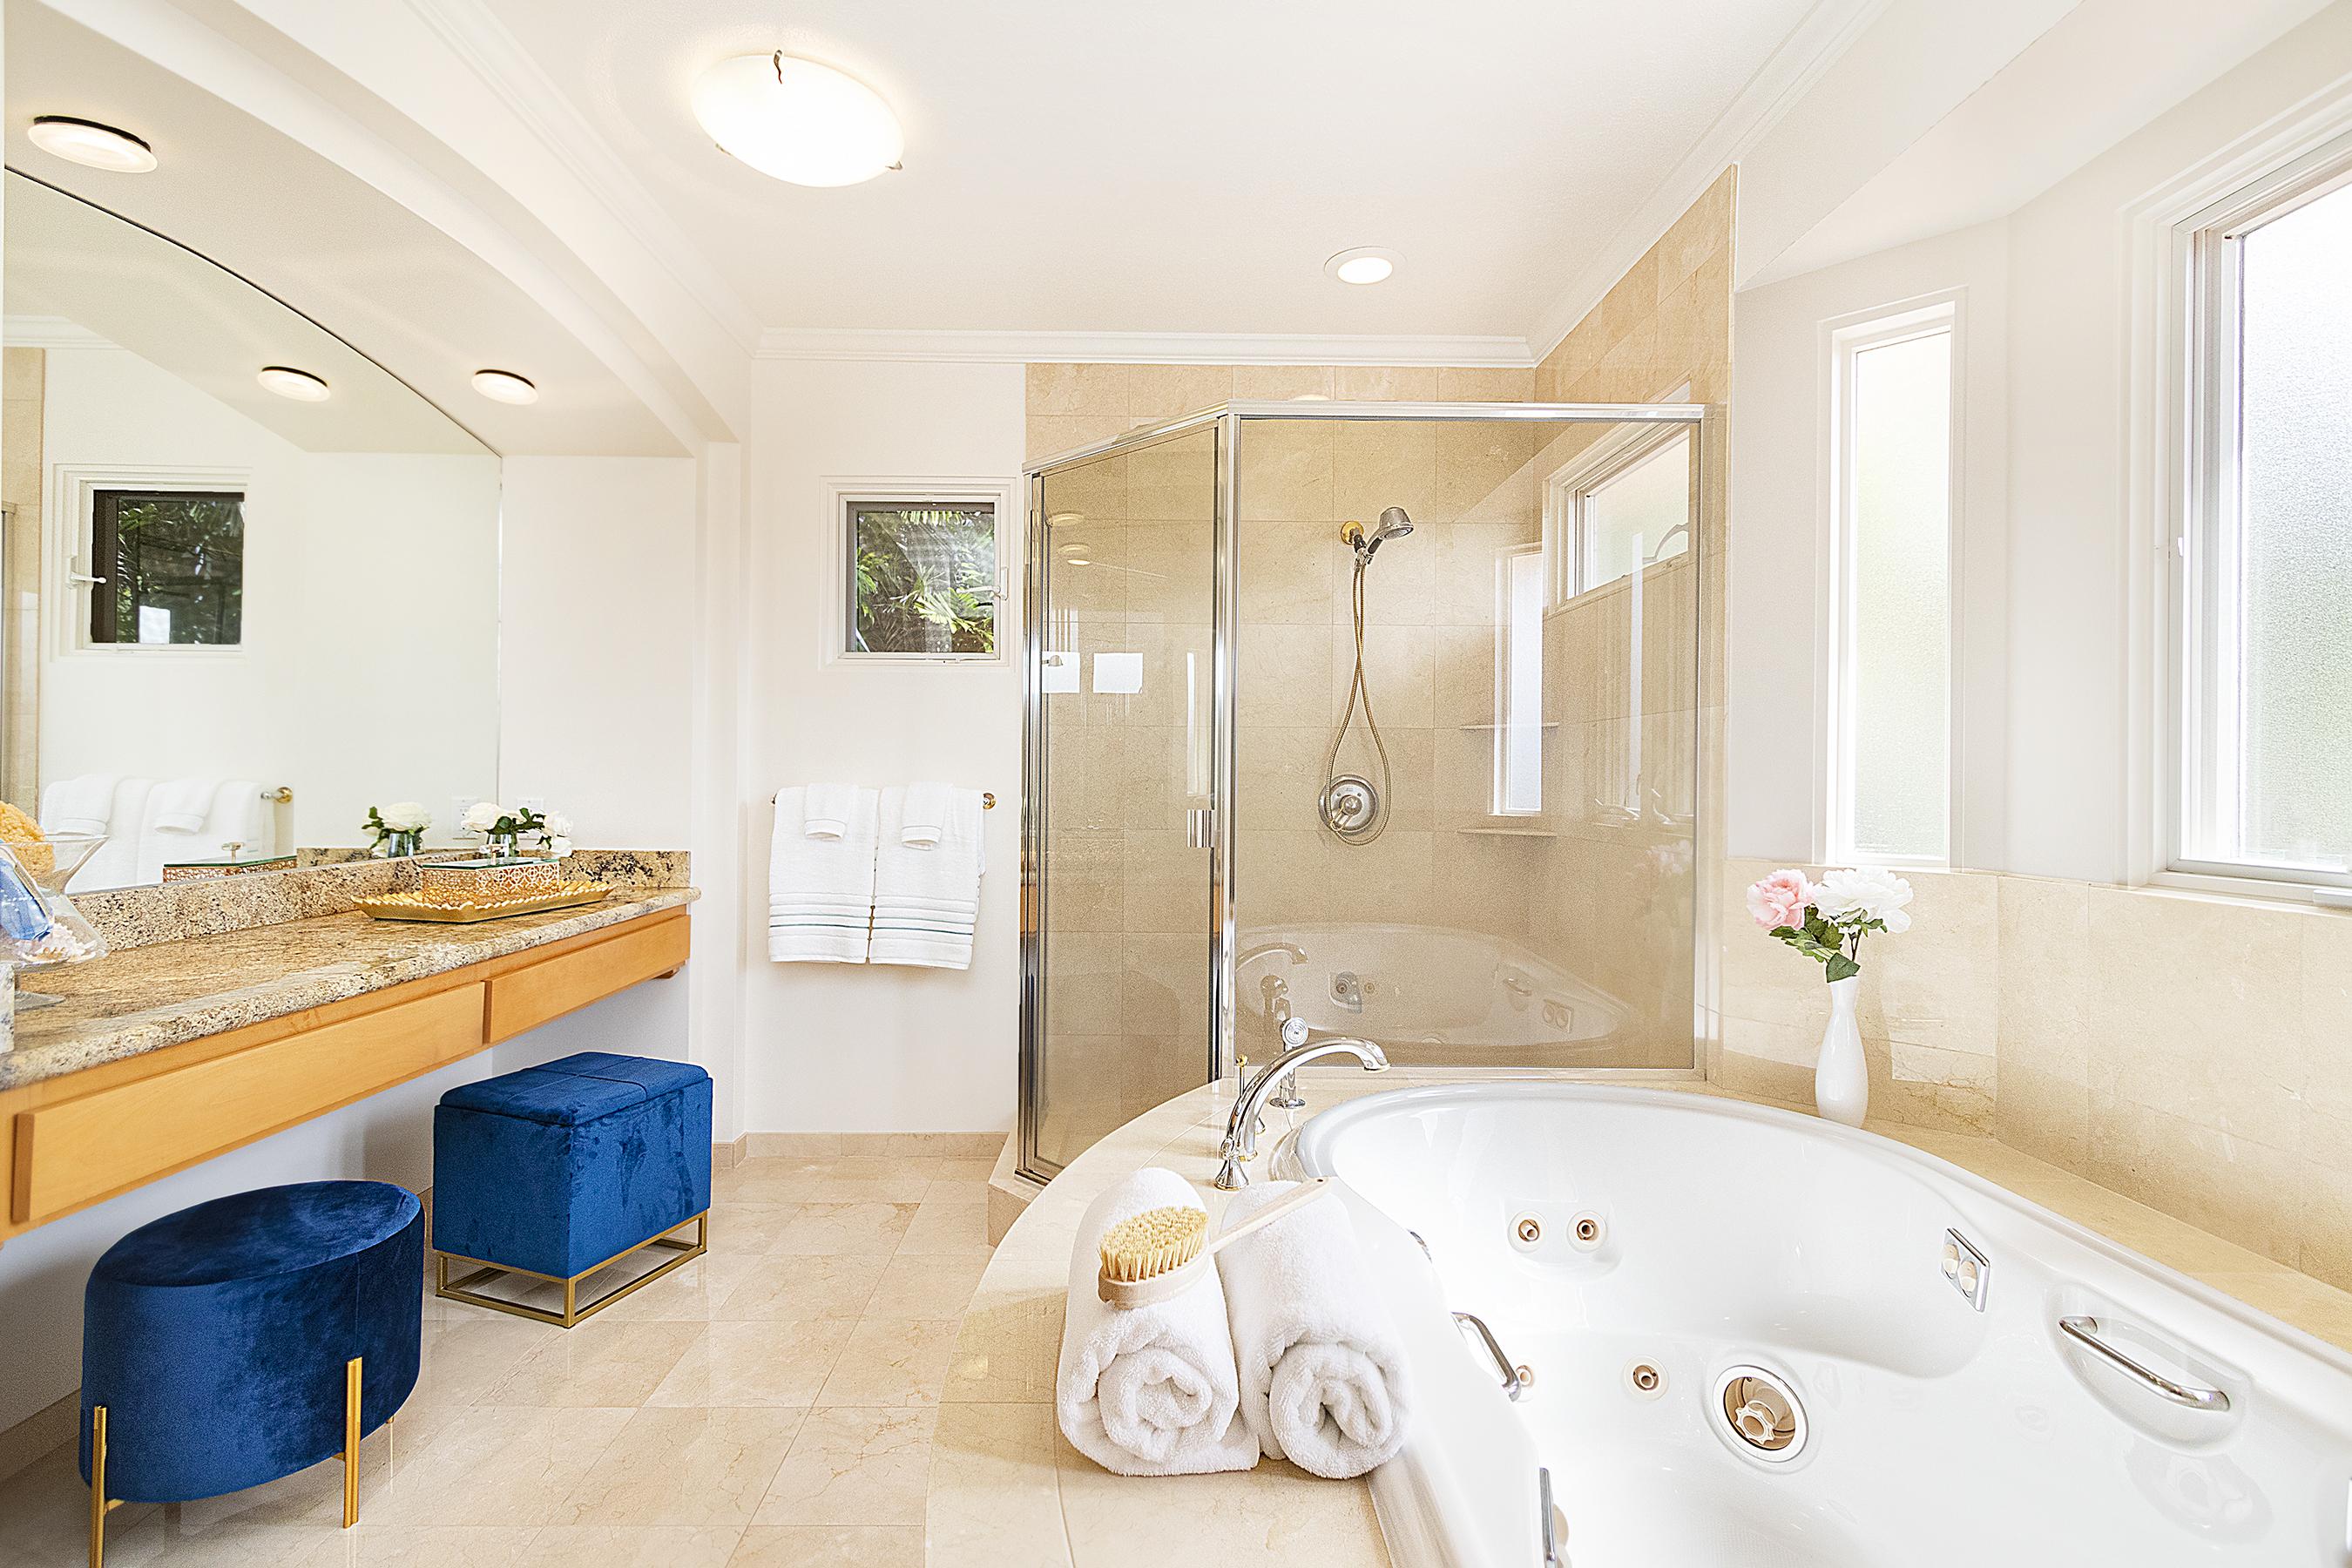 Master bathroom shower and tub at 4323 Kaikoo Place, Honolulu, HI 96816